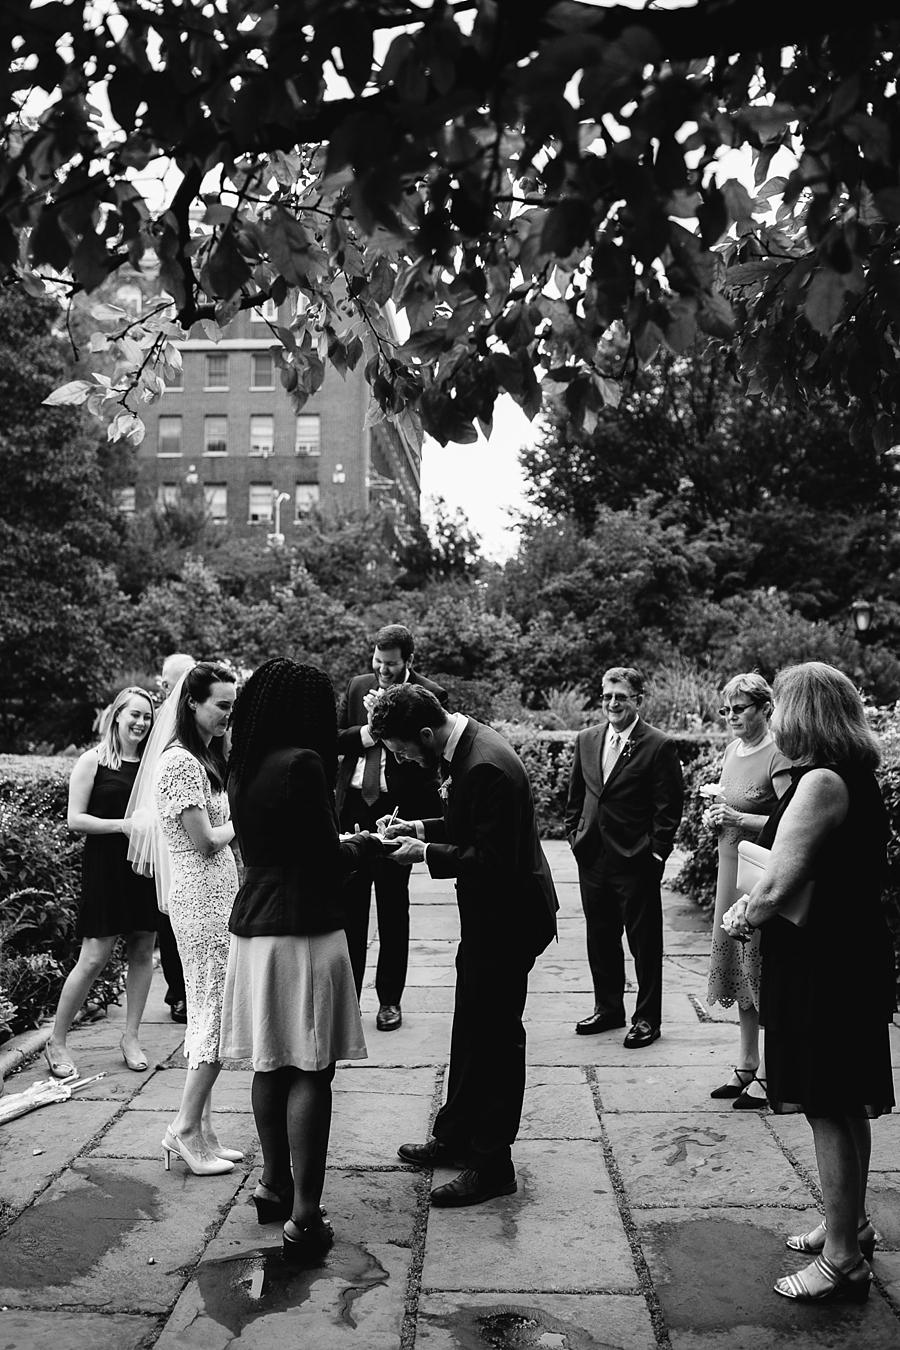 Central-park-wedding-elopement-new-york-city-abi-q-photography--174.jpg